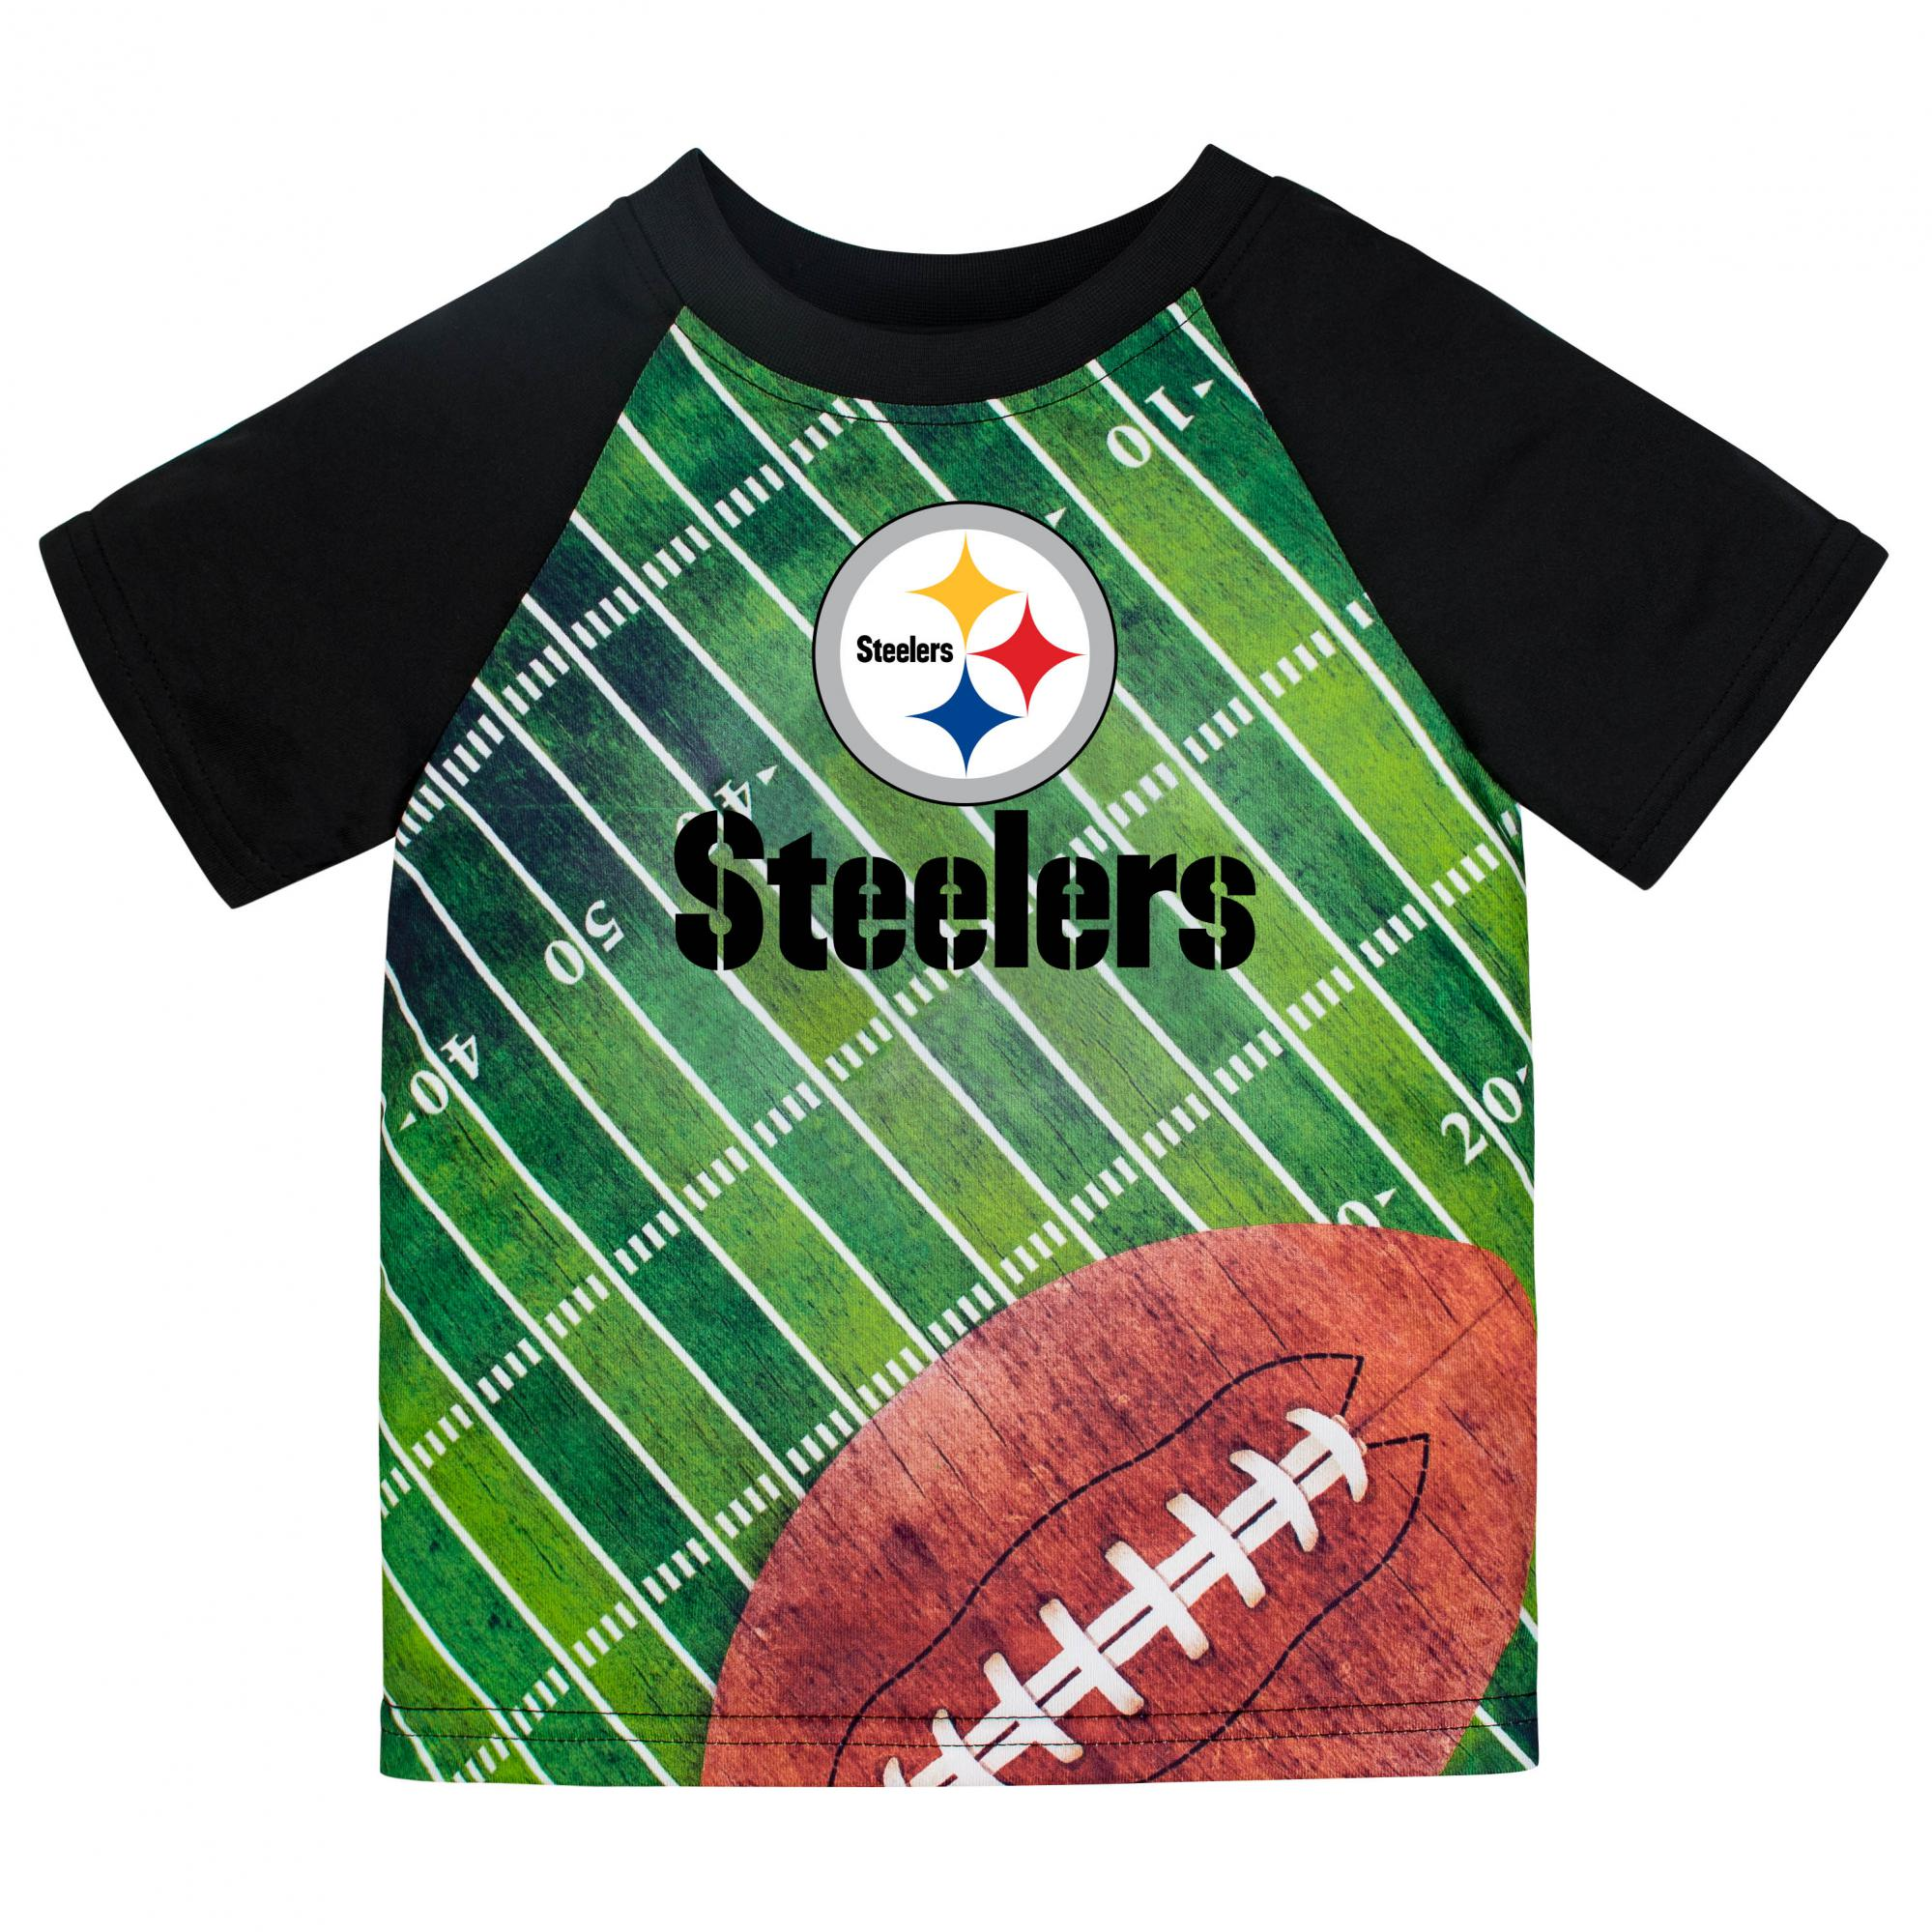 steelers-nfl-sublimation-toddler-tee-football-field-football.jpg